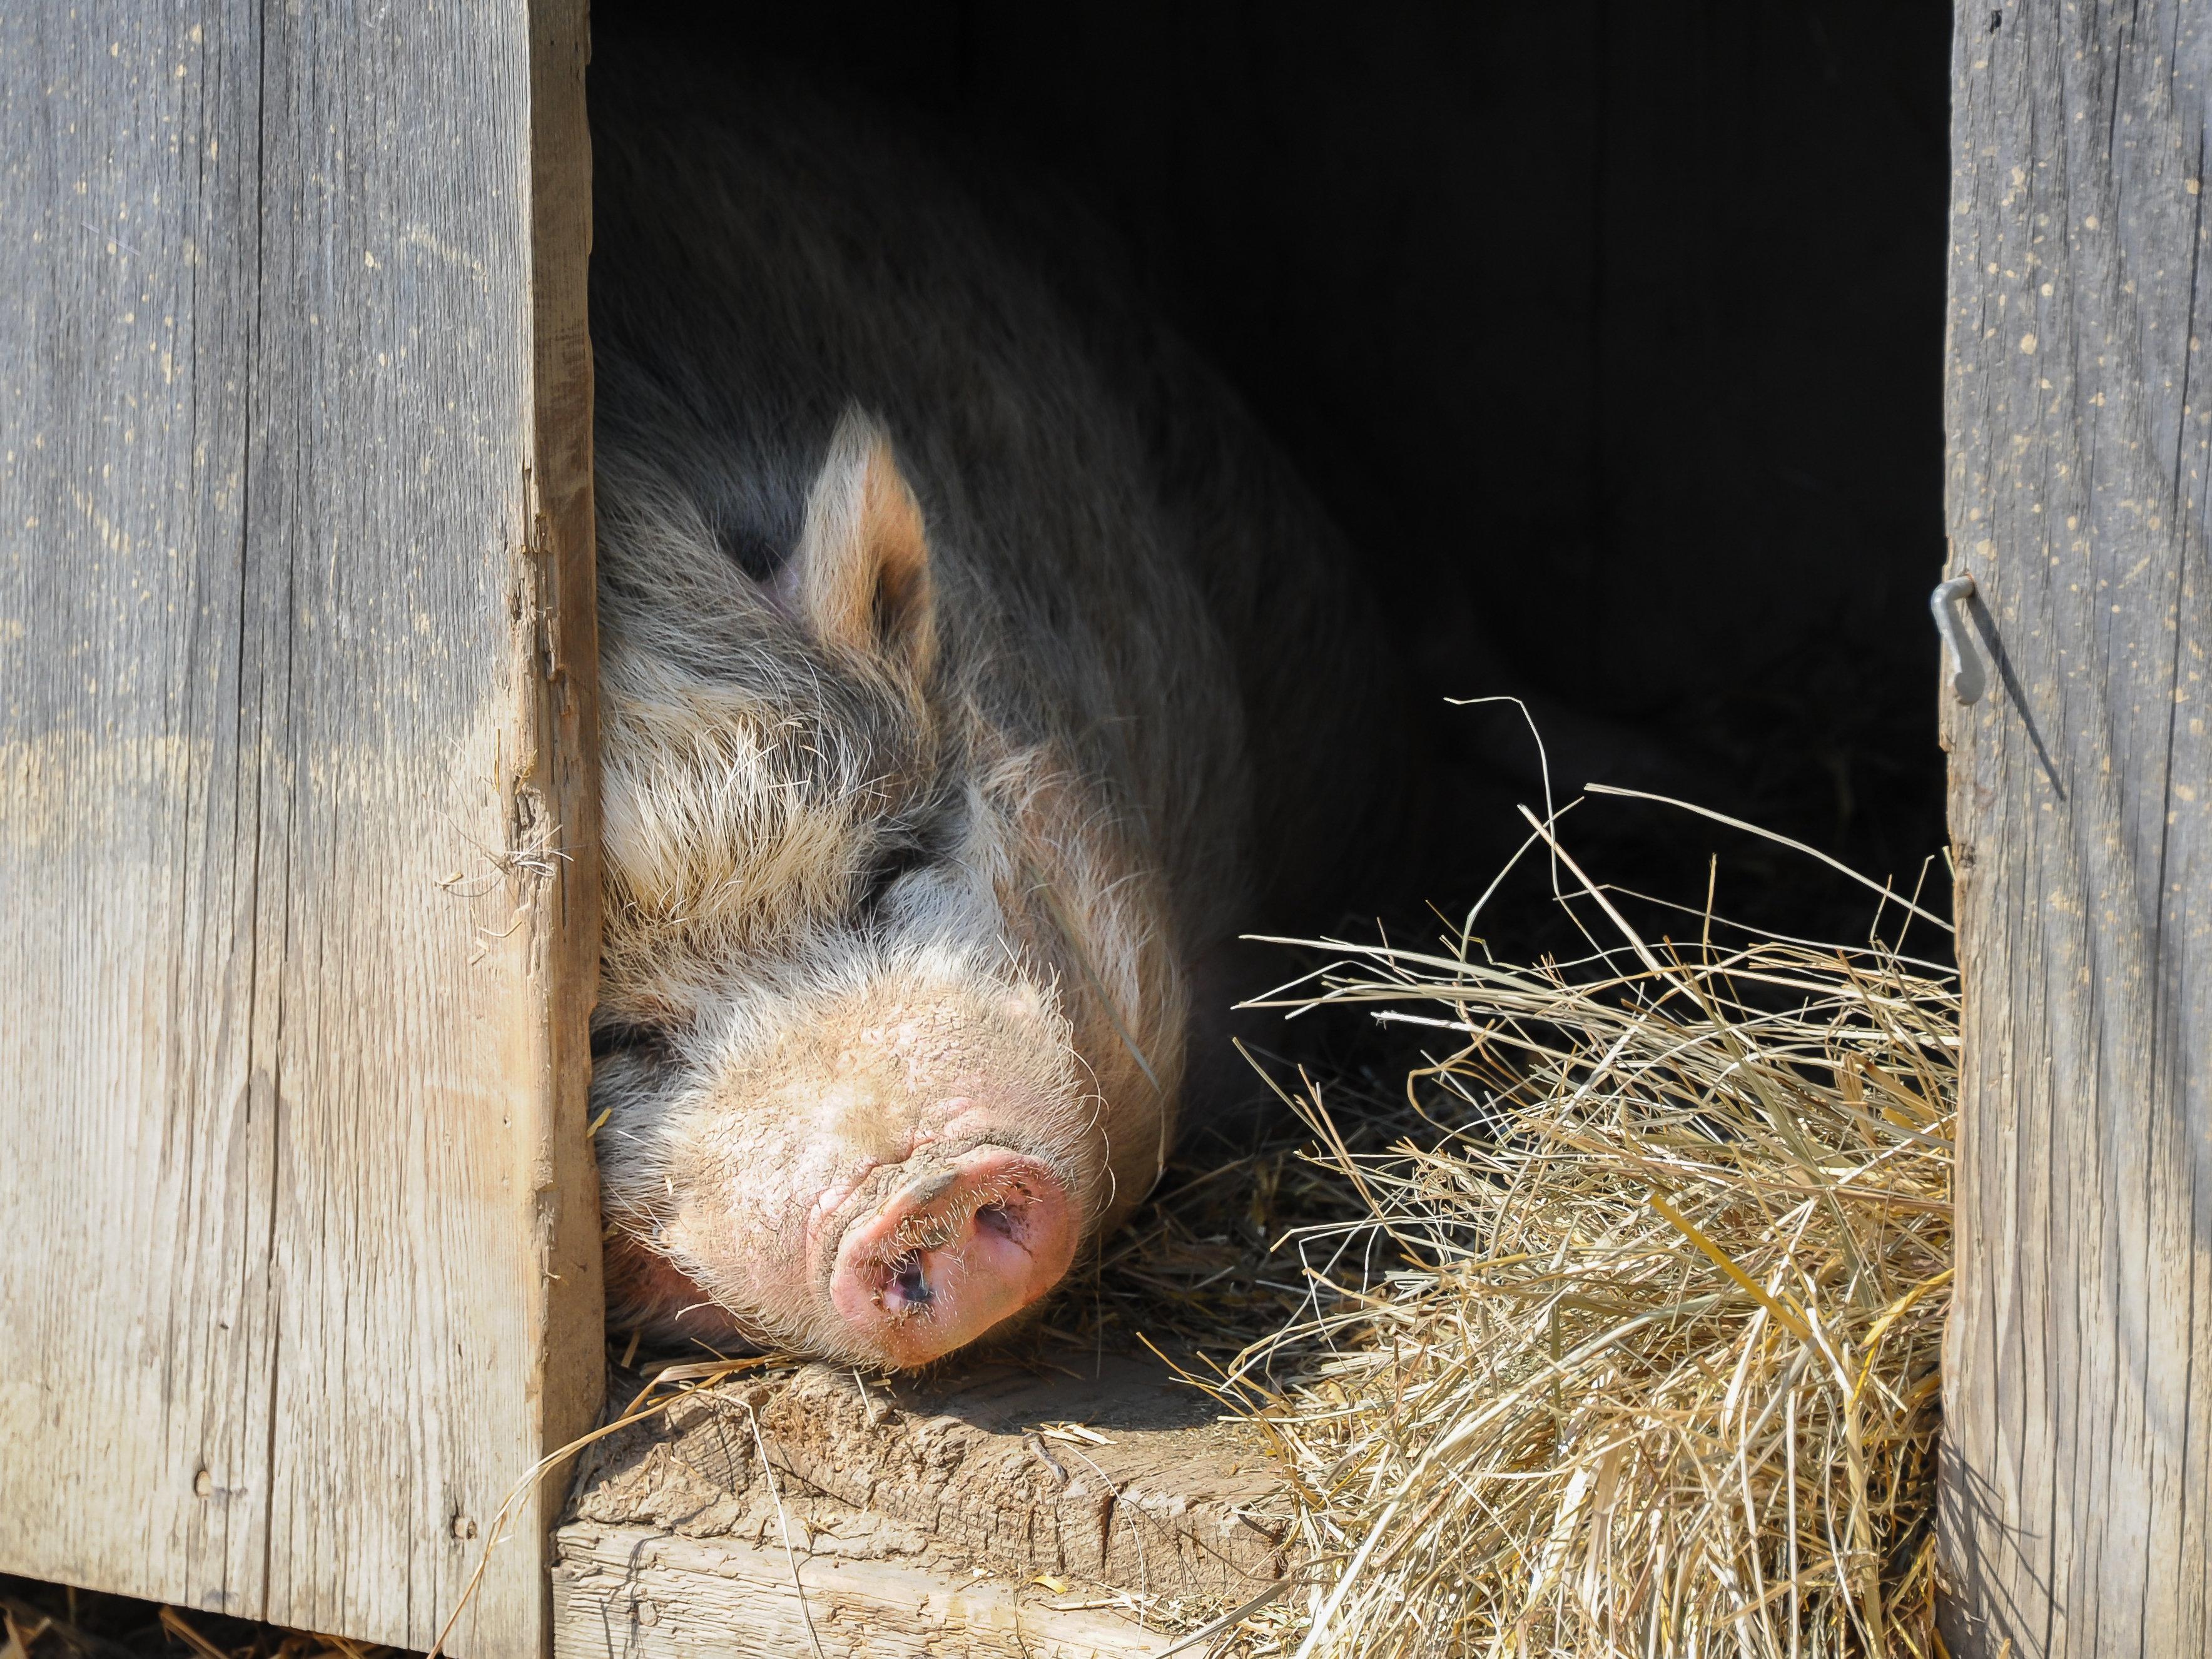 A Vietnamese pot bellied pig (Sus scrofa f. domestica) on a farm